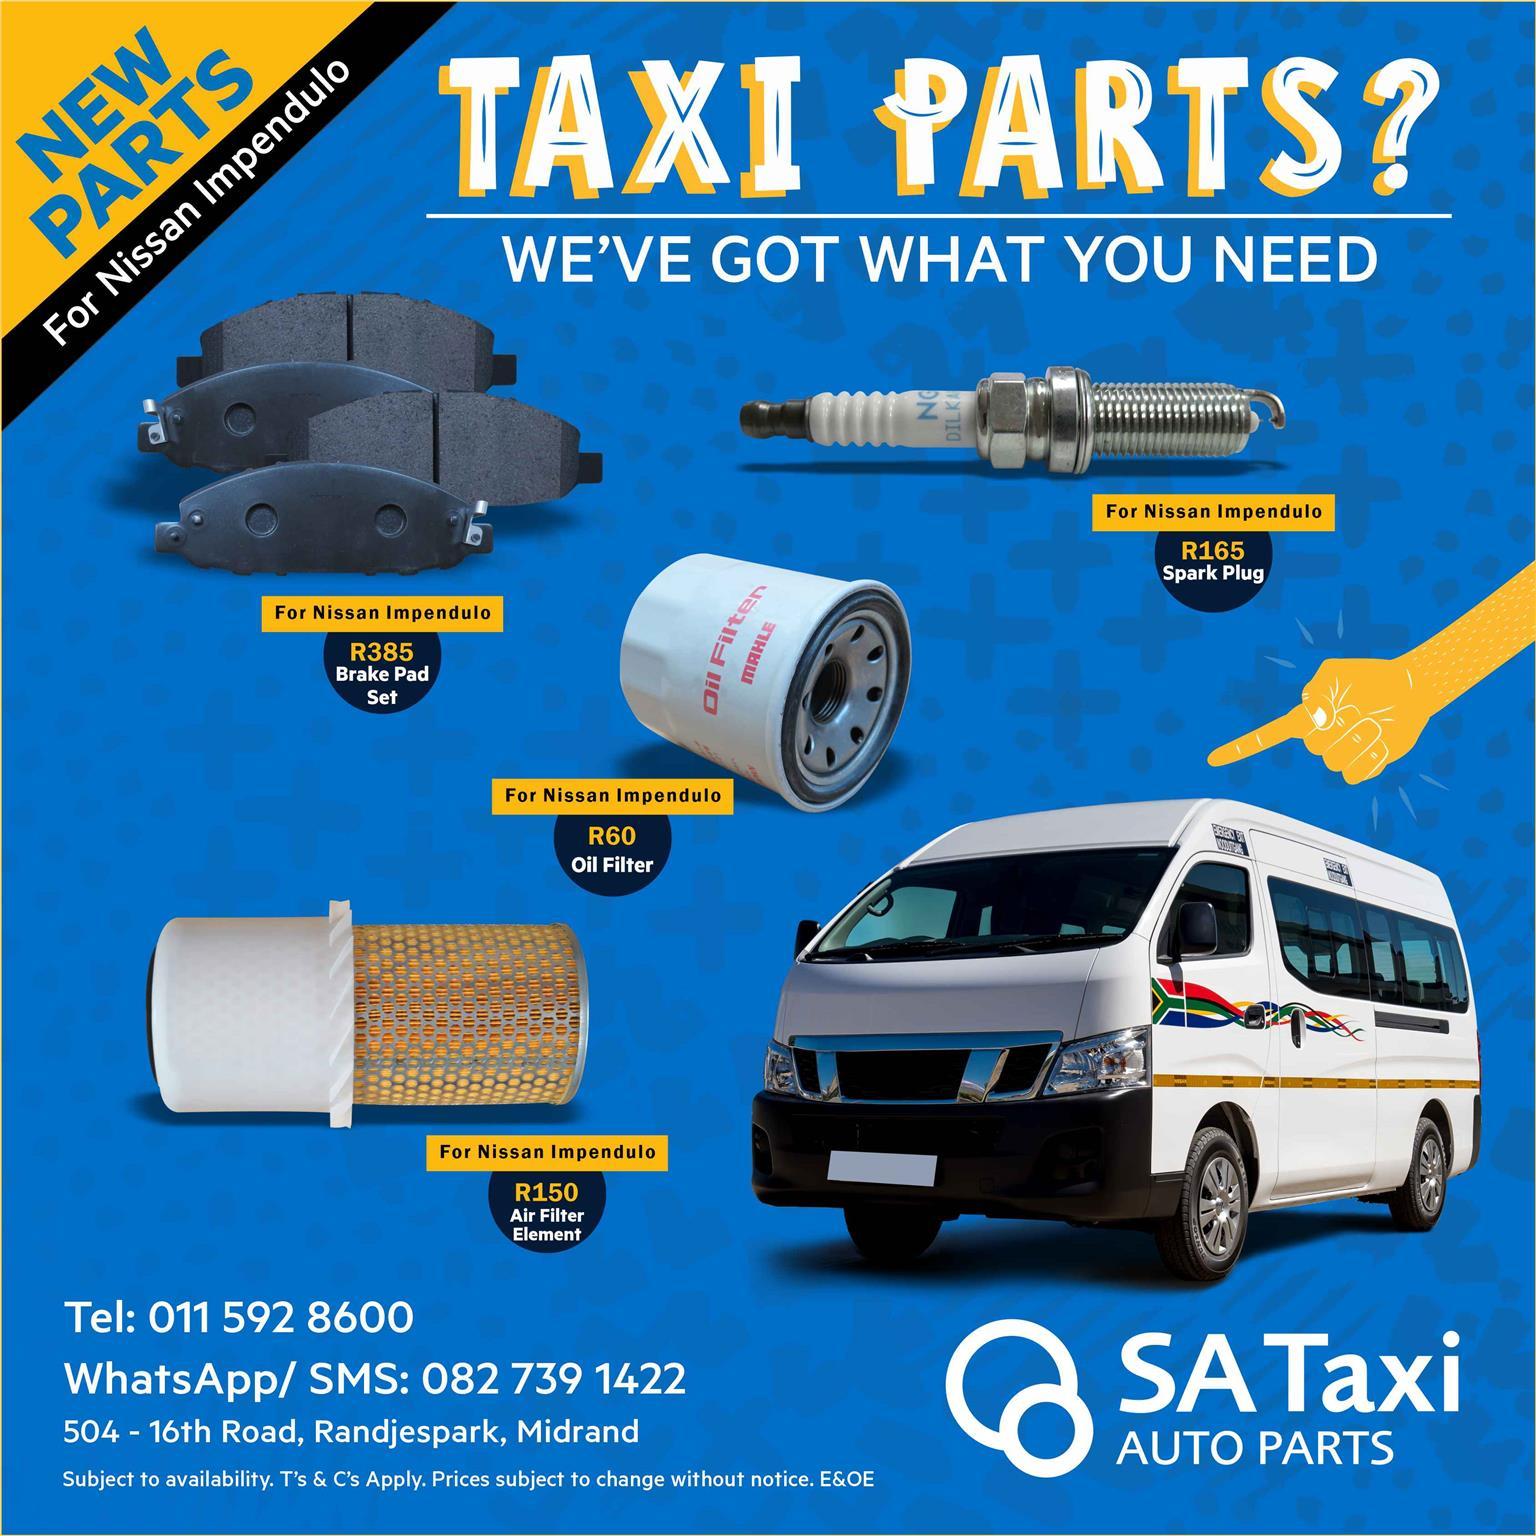 NEW CRANK SENSOR suitable for Nissan NV350 Impendulo - SA Taxi Auto Parts quality spares